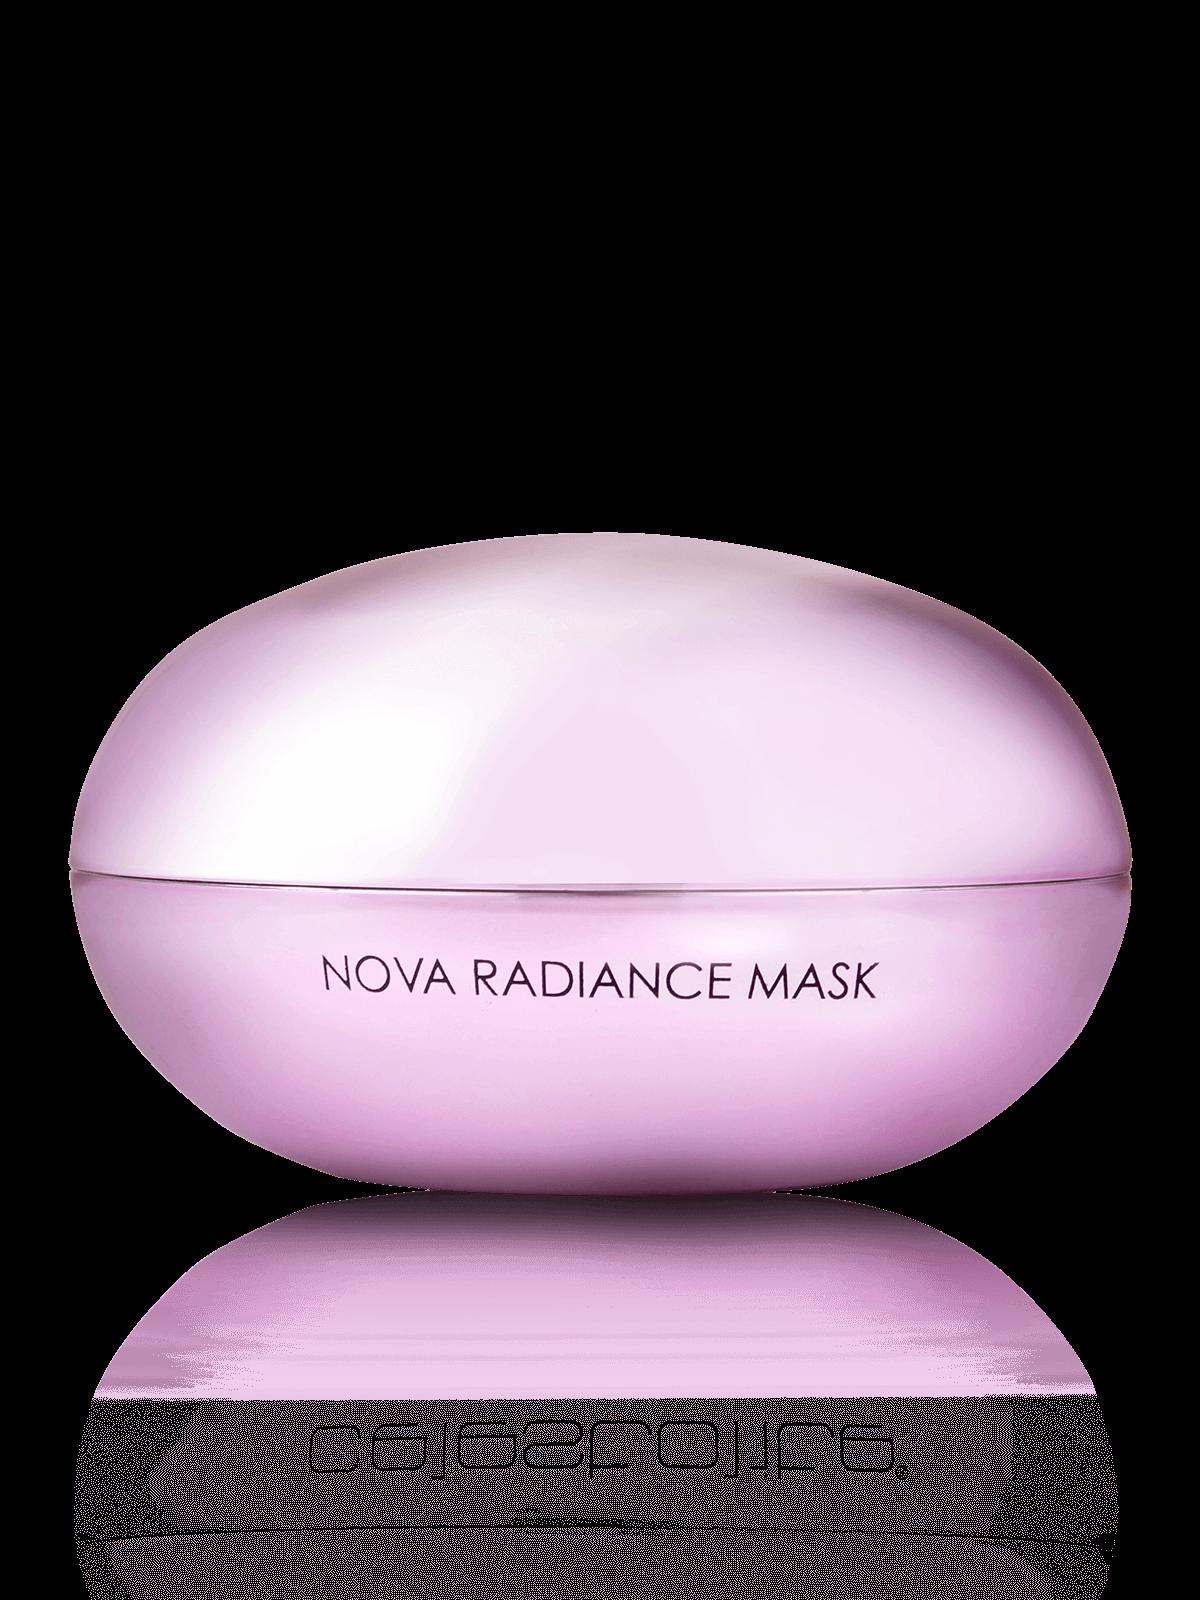 Nova Radiance Mask back